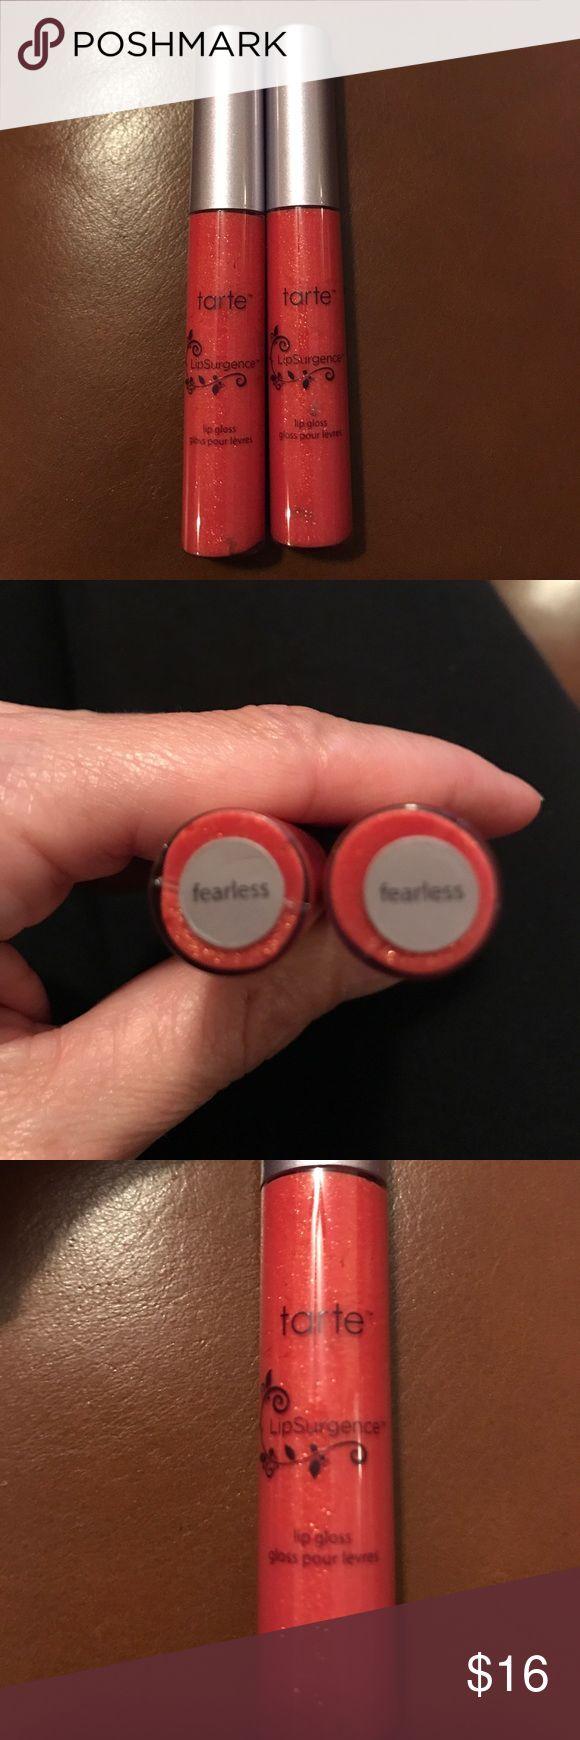 New Tarte LipSurgence Lip Gloss Brand new, never used, LipSurgence in FEARLESS tarte Makeup Lip Balm & Gloss